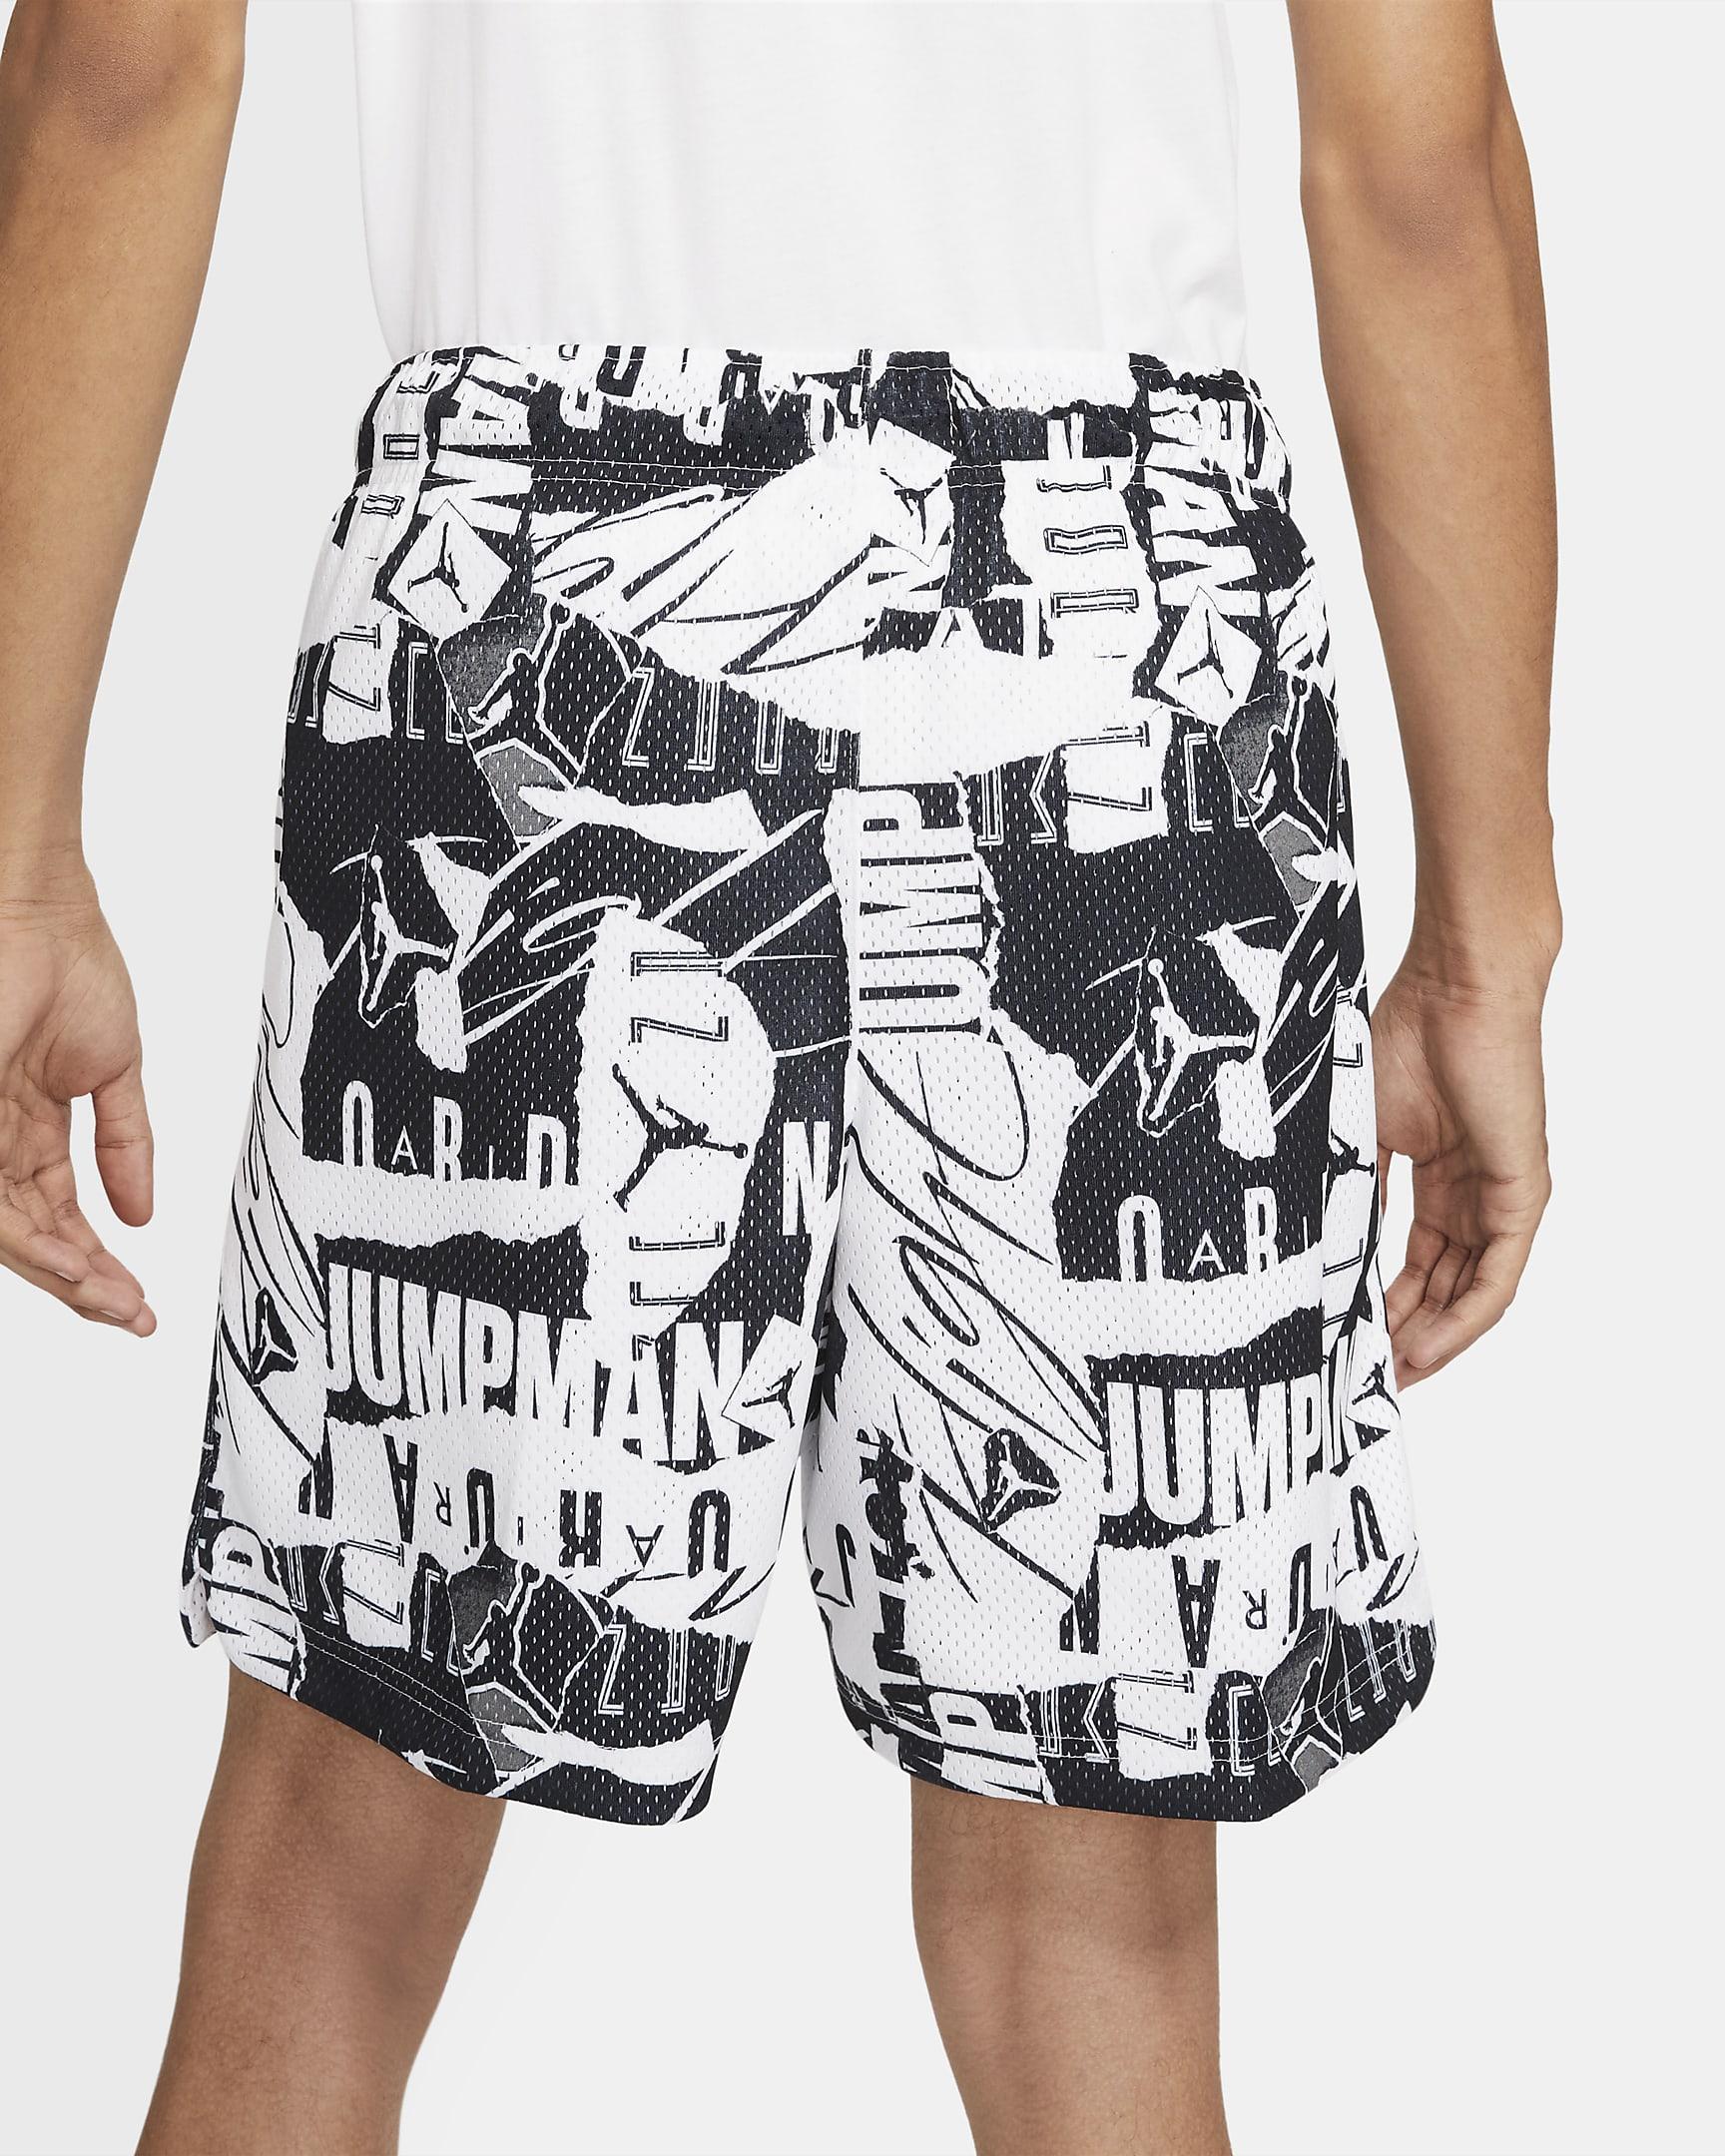 jordan-essentials-mens-printed-mesh-shorts-cMXF76-3.png